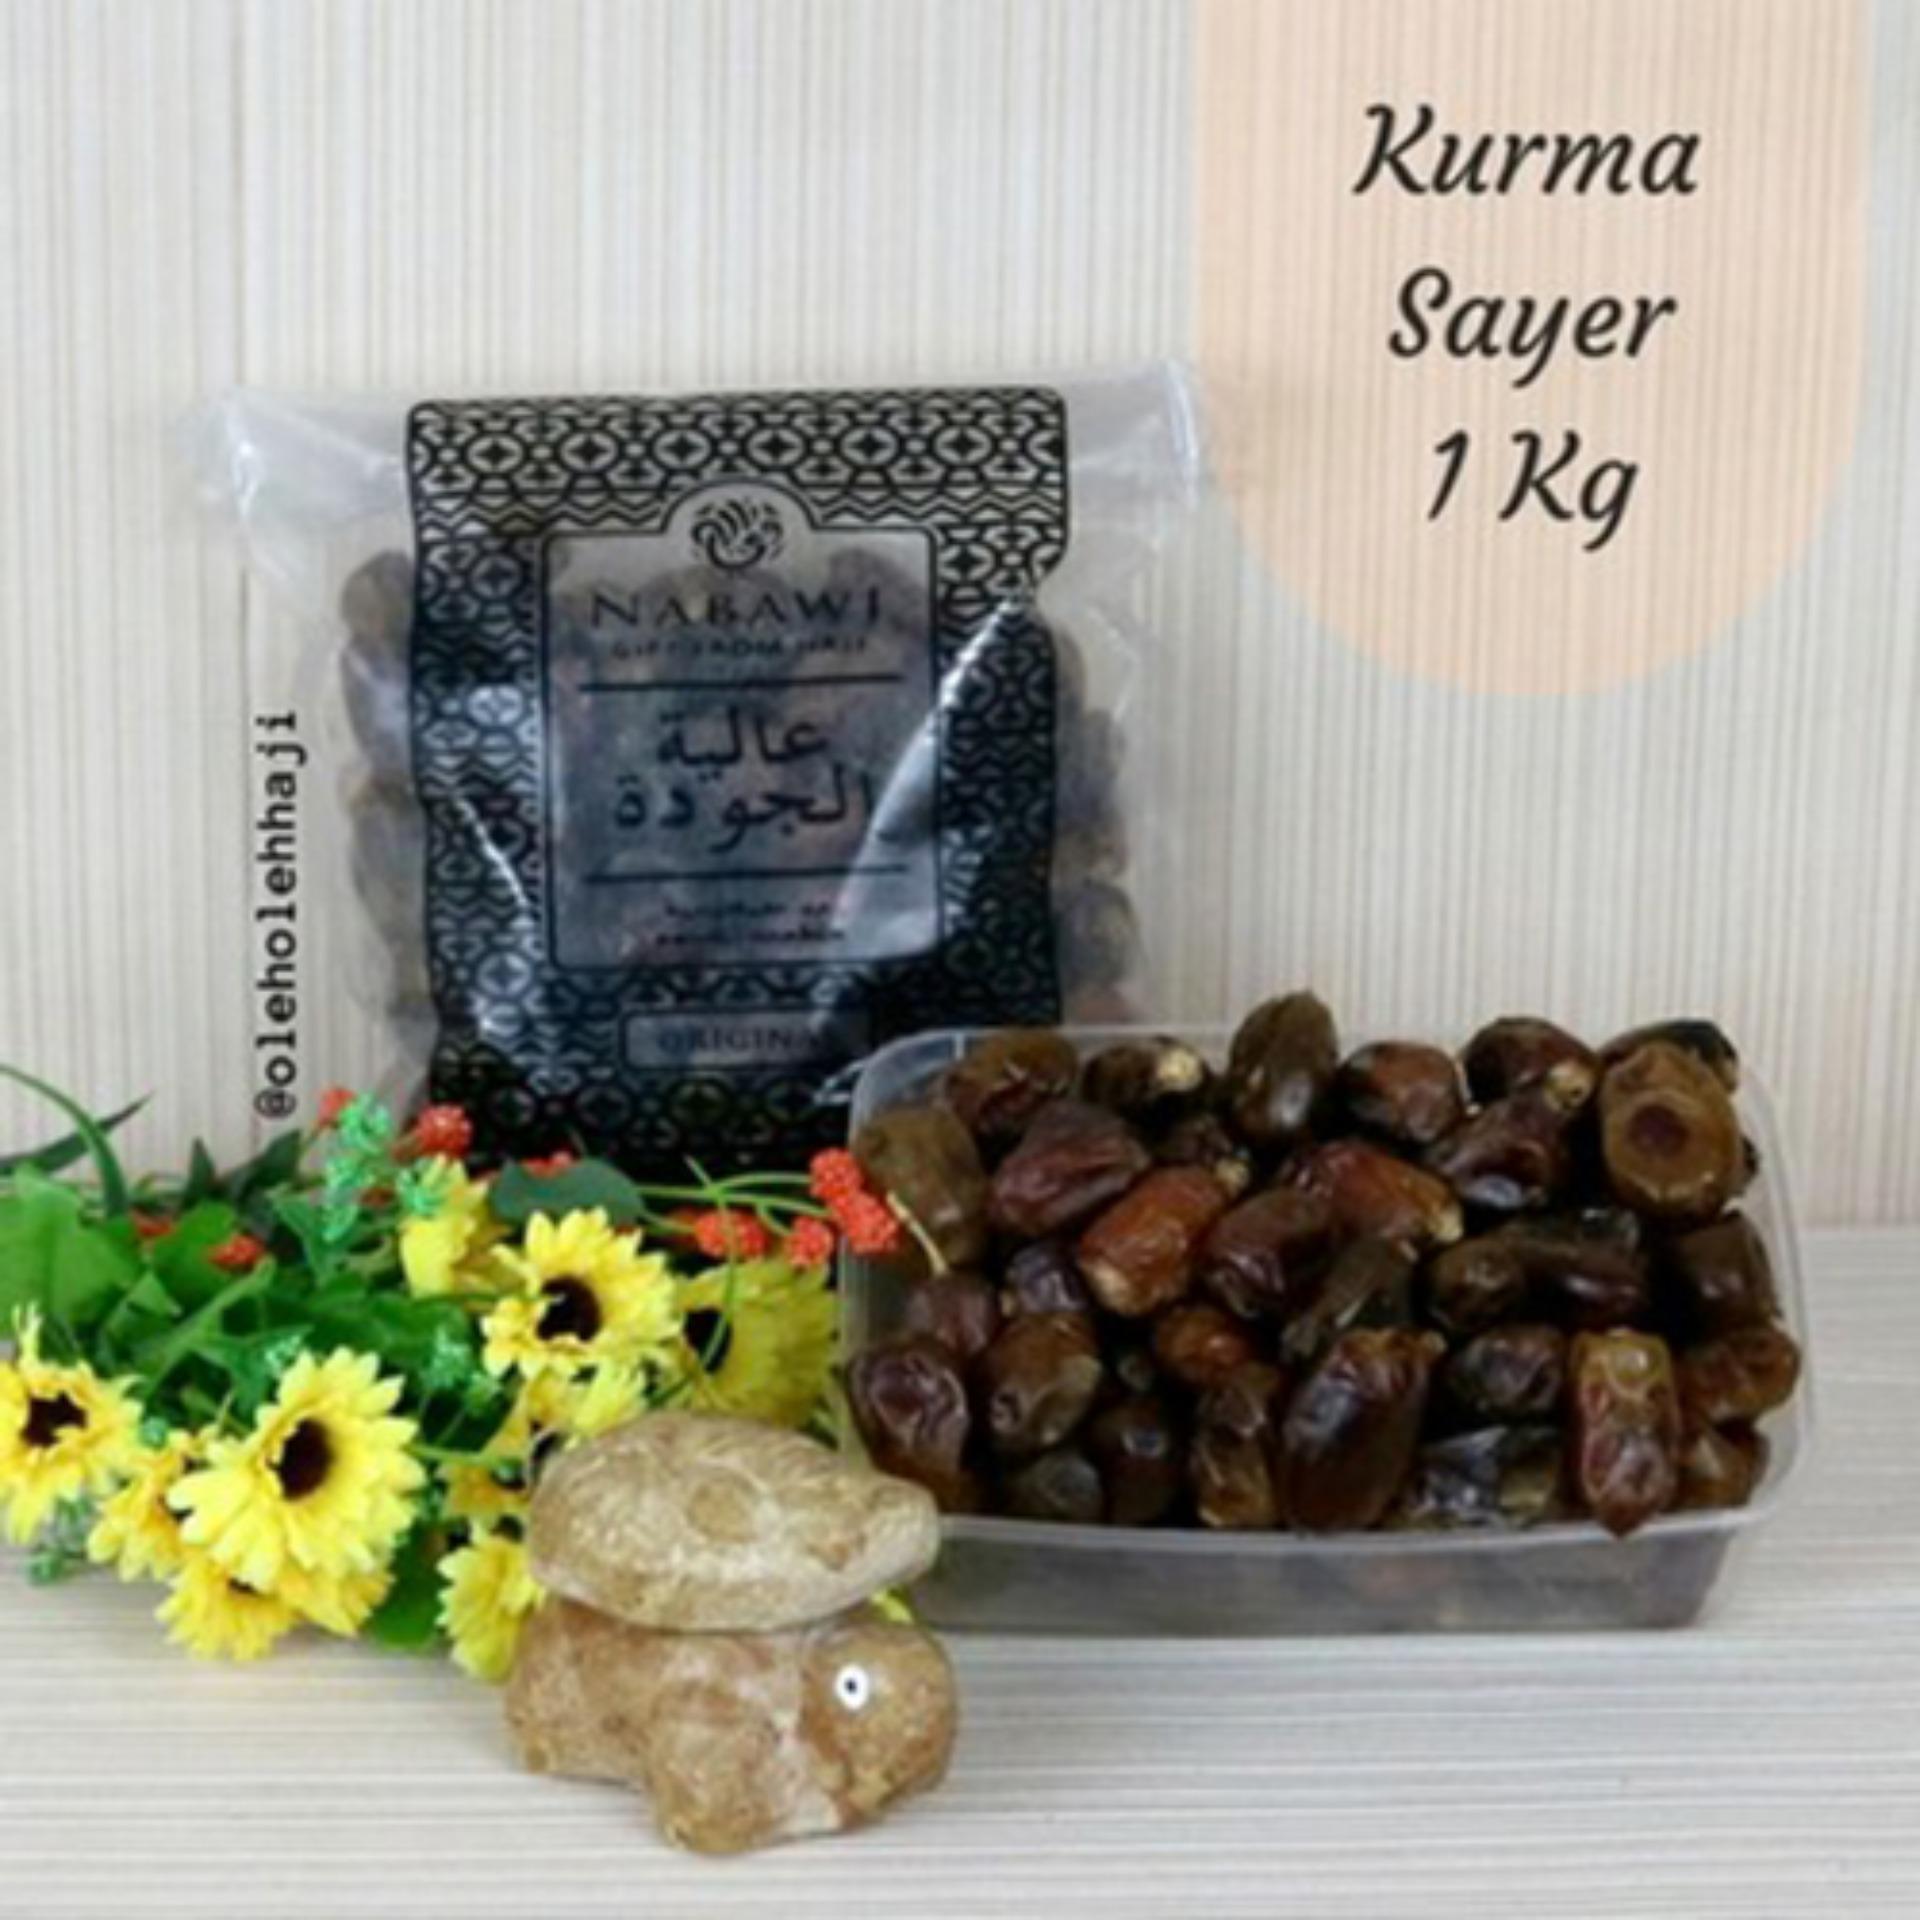 Nabawi Kurma Sayer 1kg